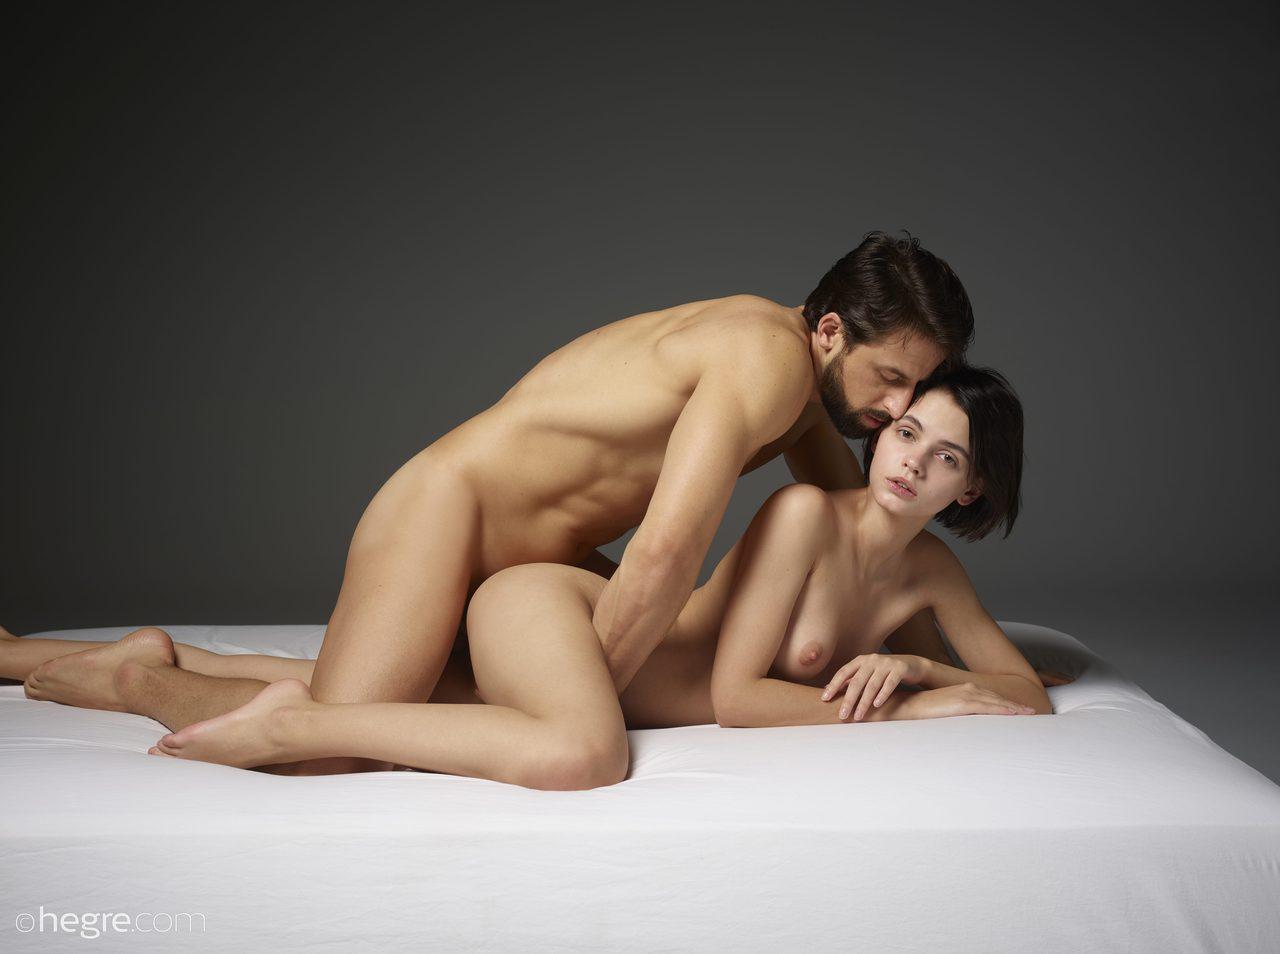 Nude Couple Taking Hot Selfie